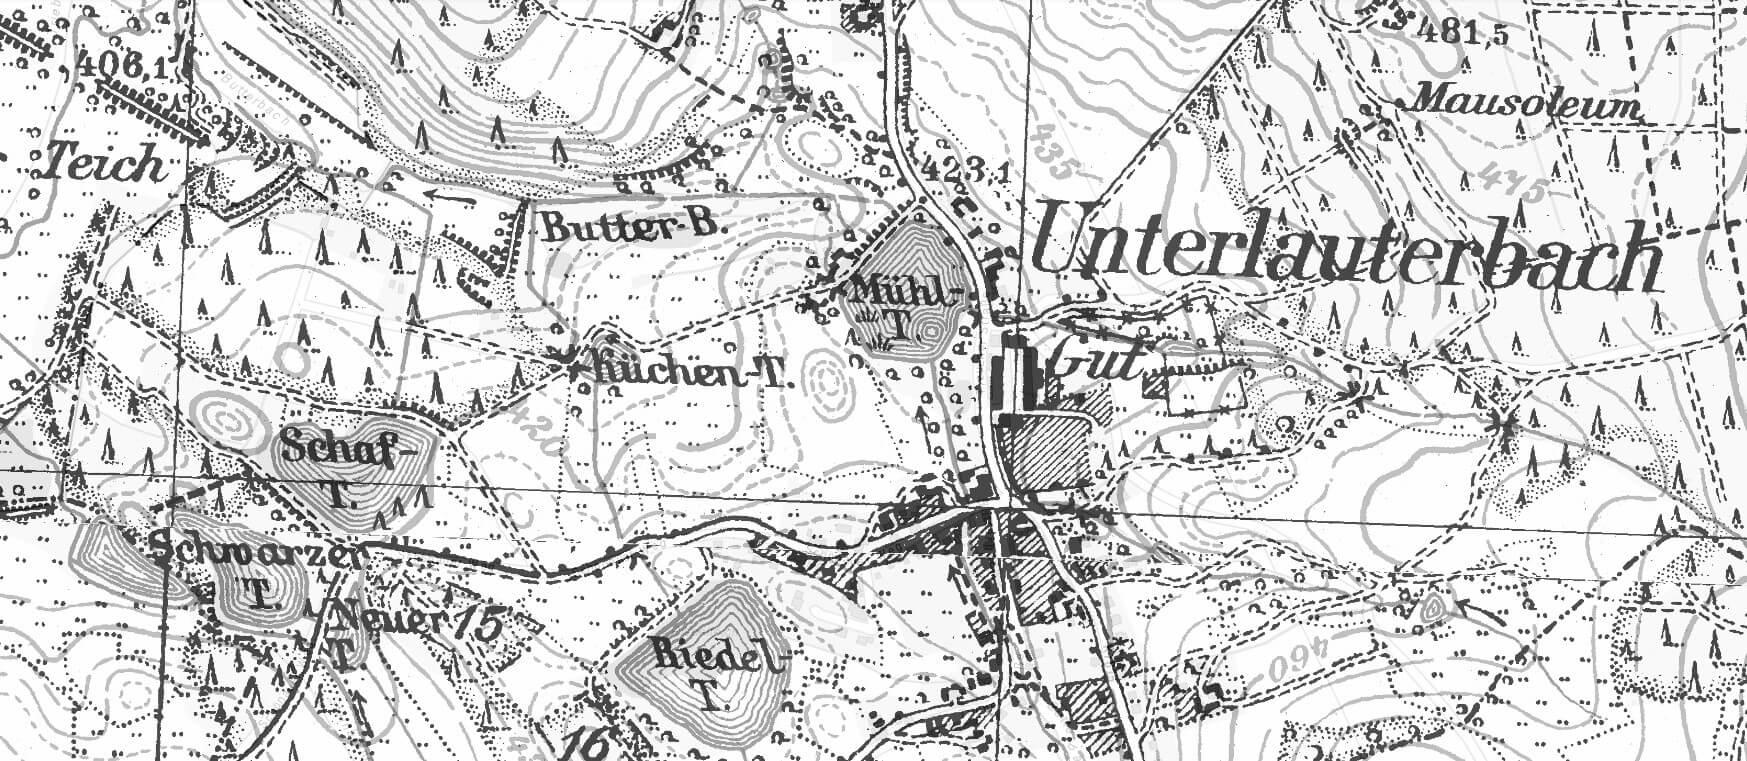 Rittergut Adlershof zu Oberlauterbach - Landkarte © Geoportal Sachsen